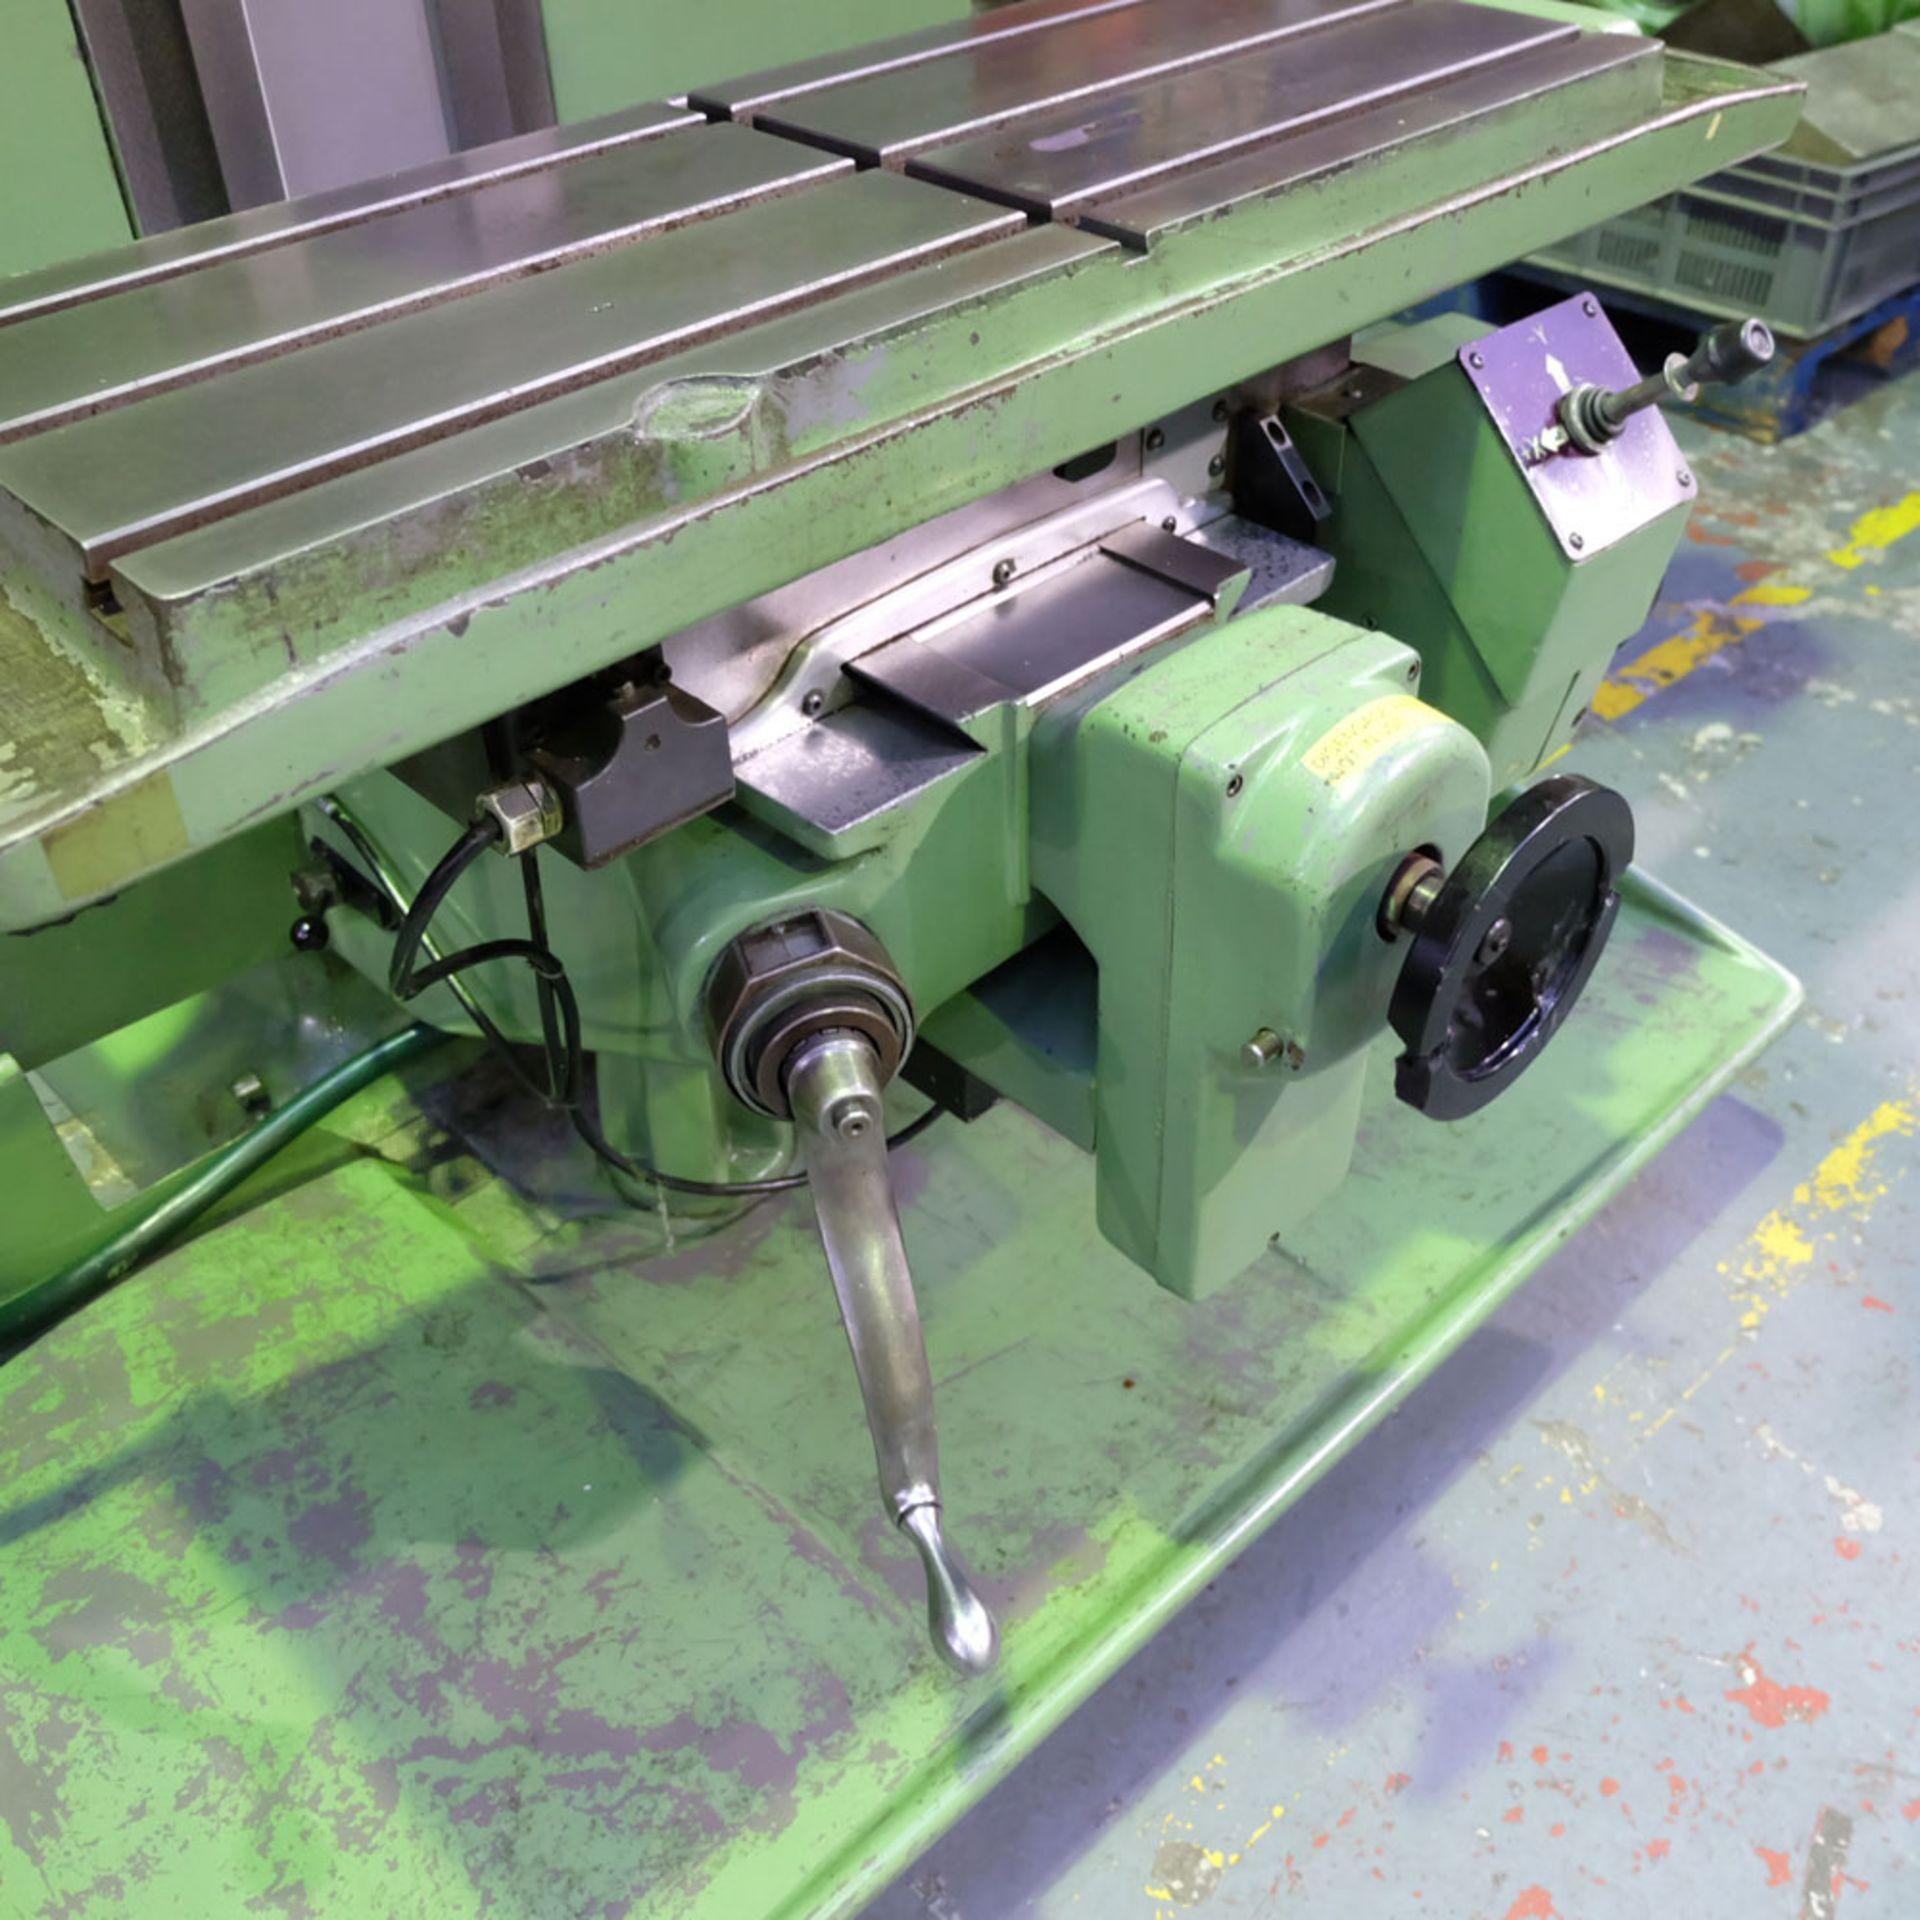 Bridgeport Series 1 MDI. CNC Mill with Heidenhain TNC131 3 Axis Control. - Image 8 of 14